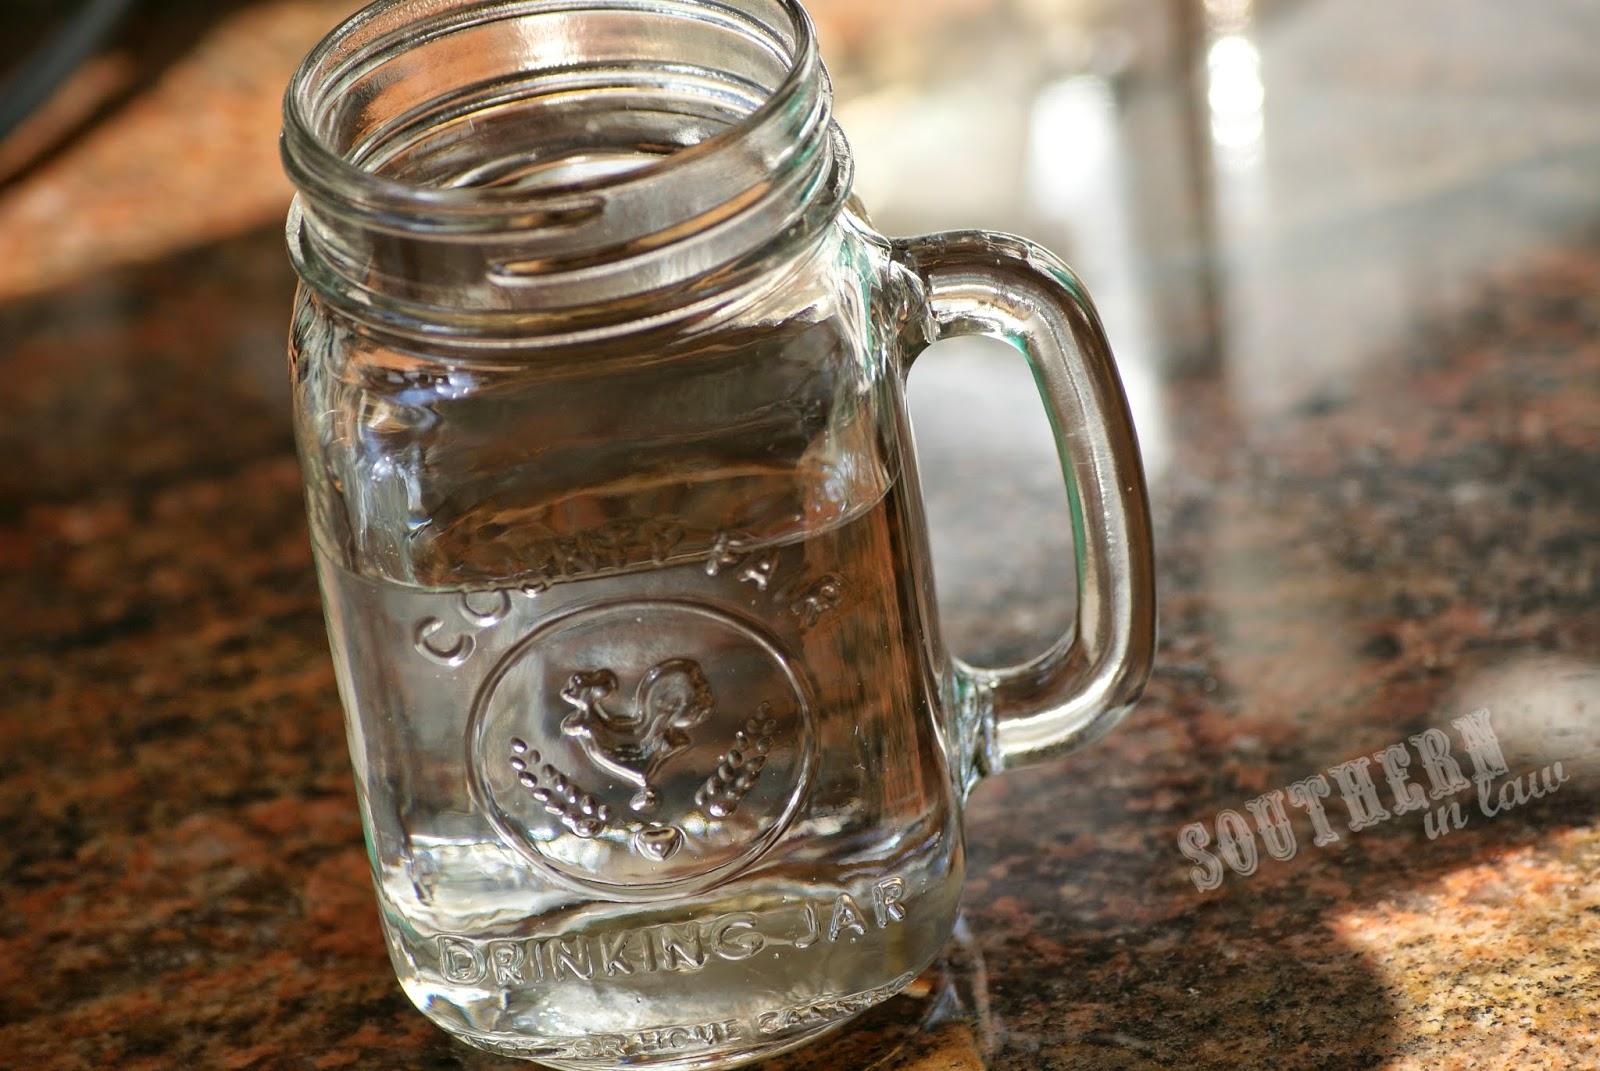 Drinking Jar from Dollar General